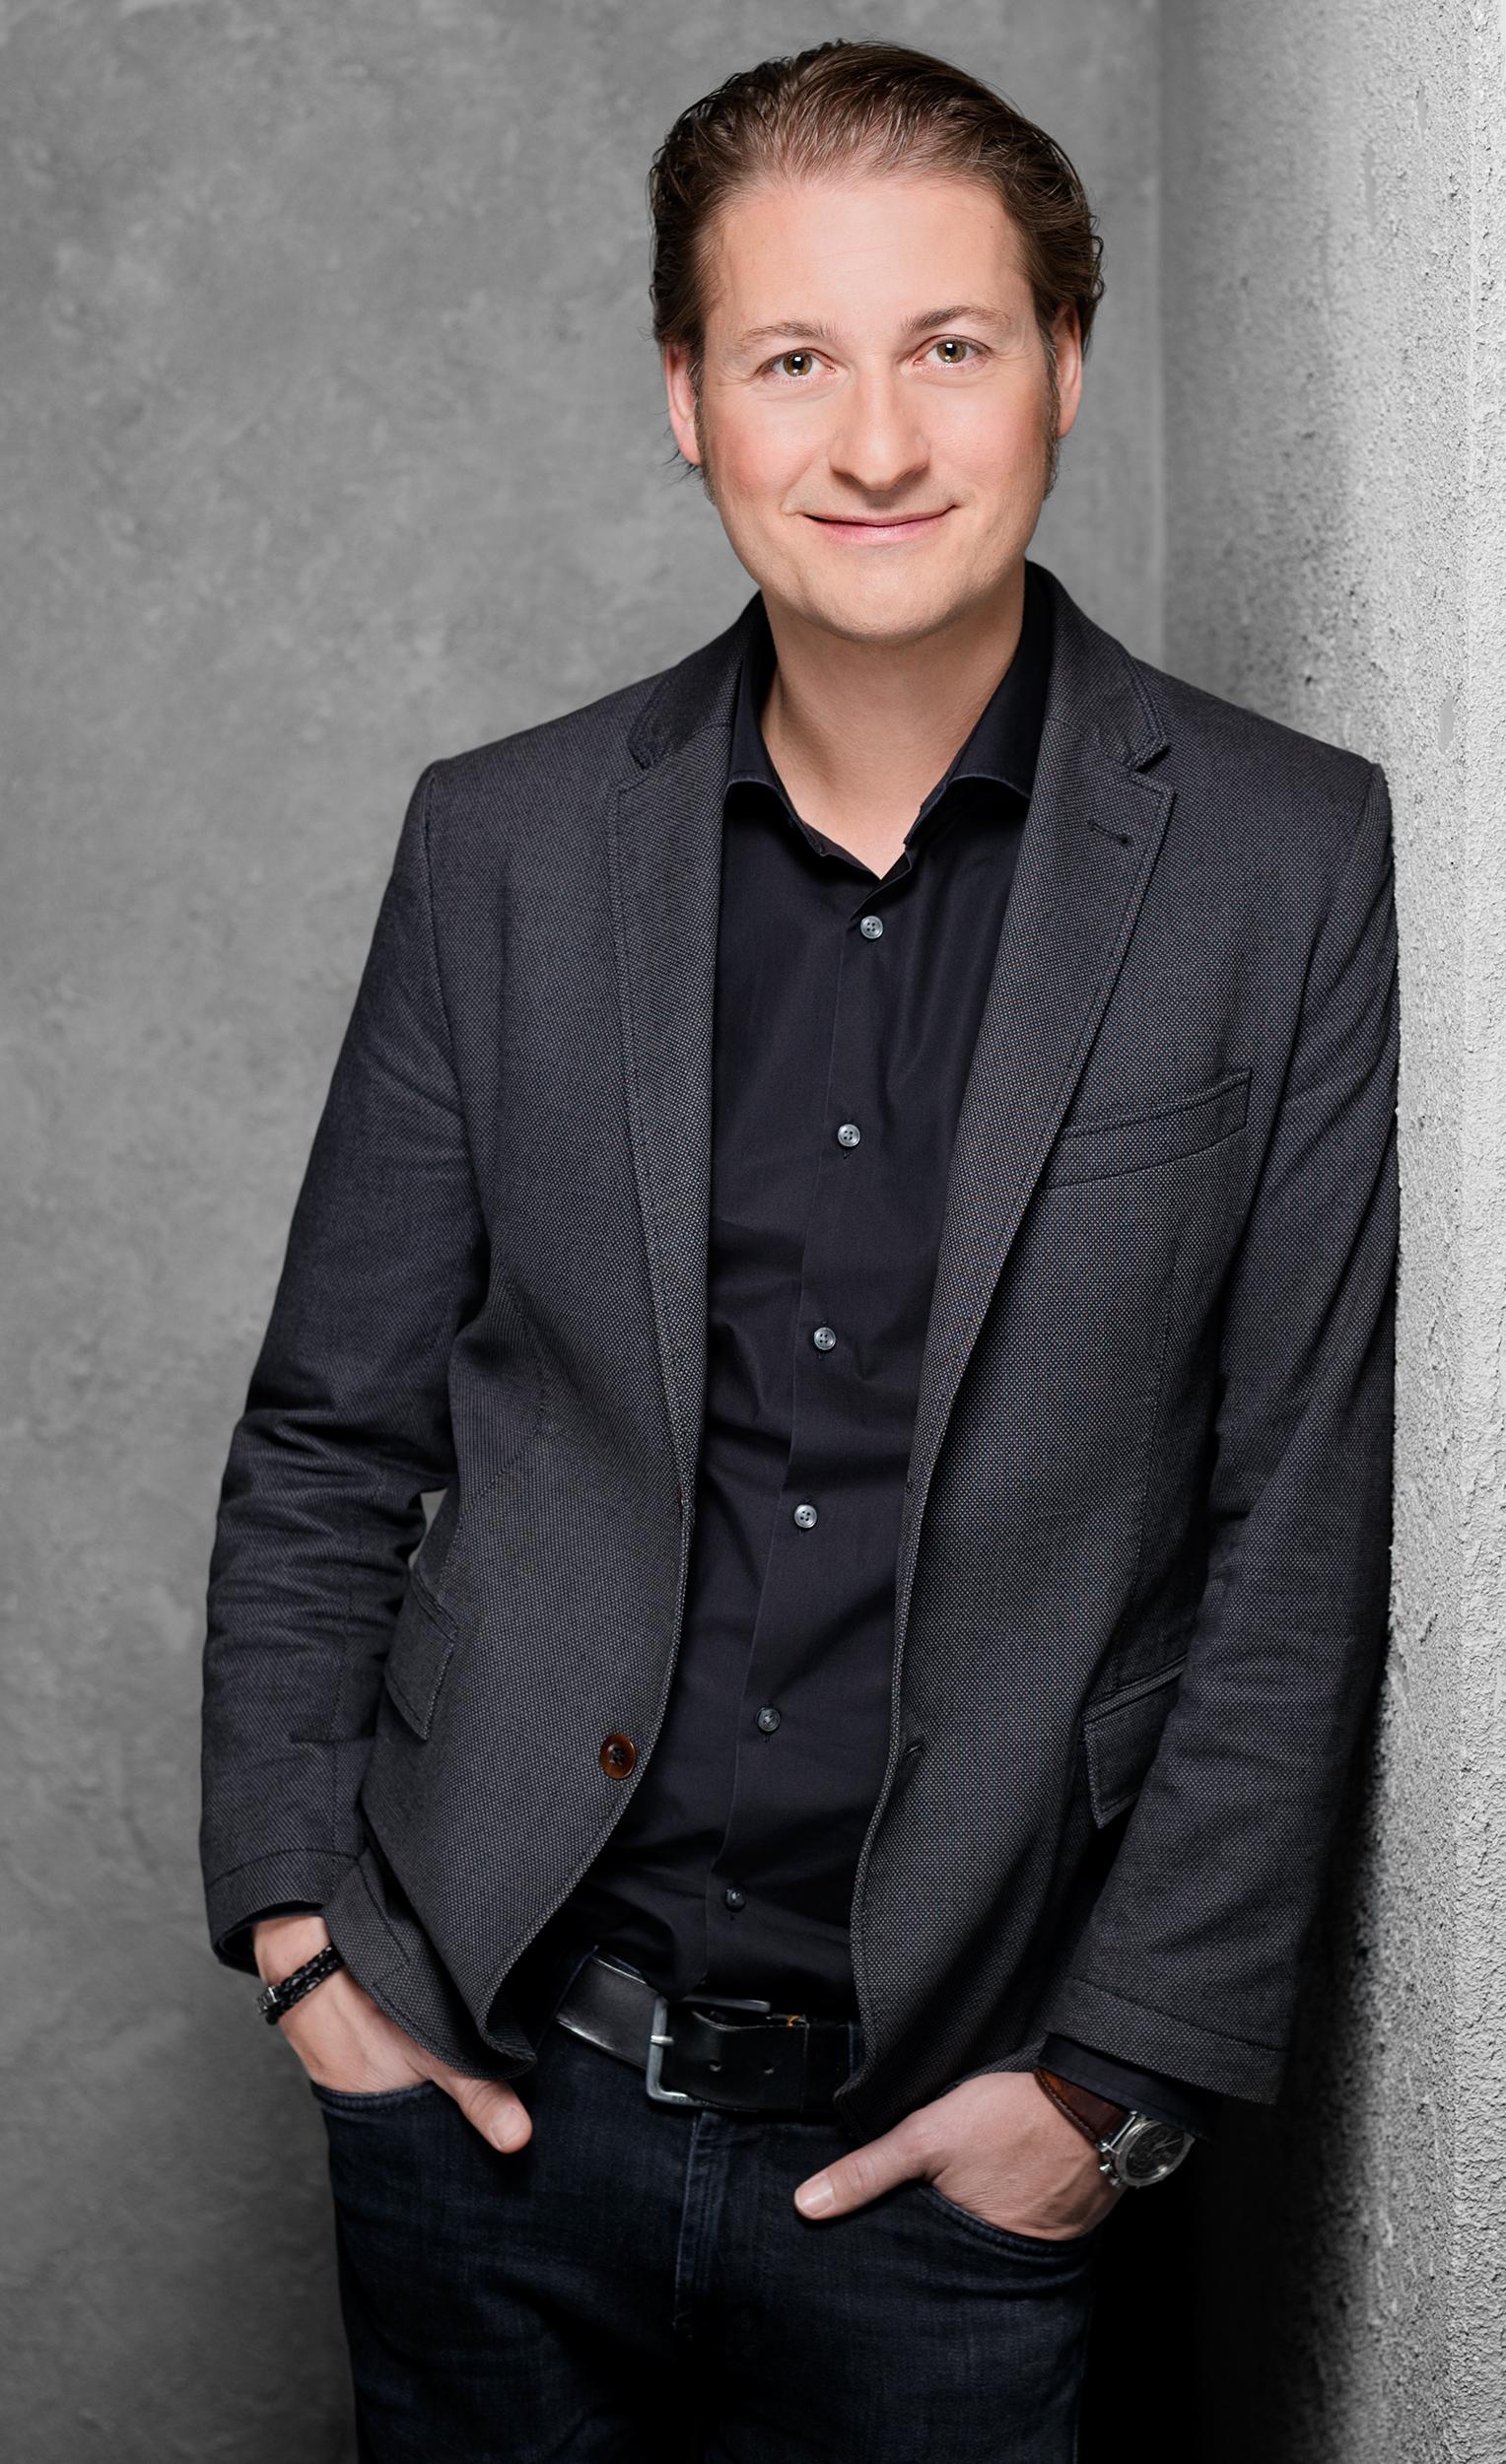 Christopher Maaß wird neuer Geschäftsführer bei Vinos.de